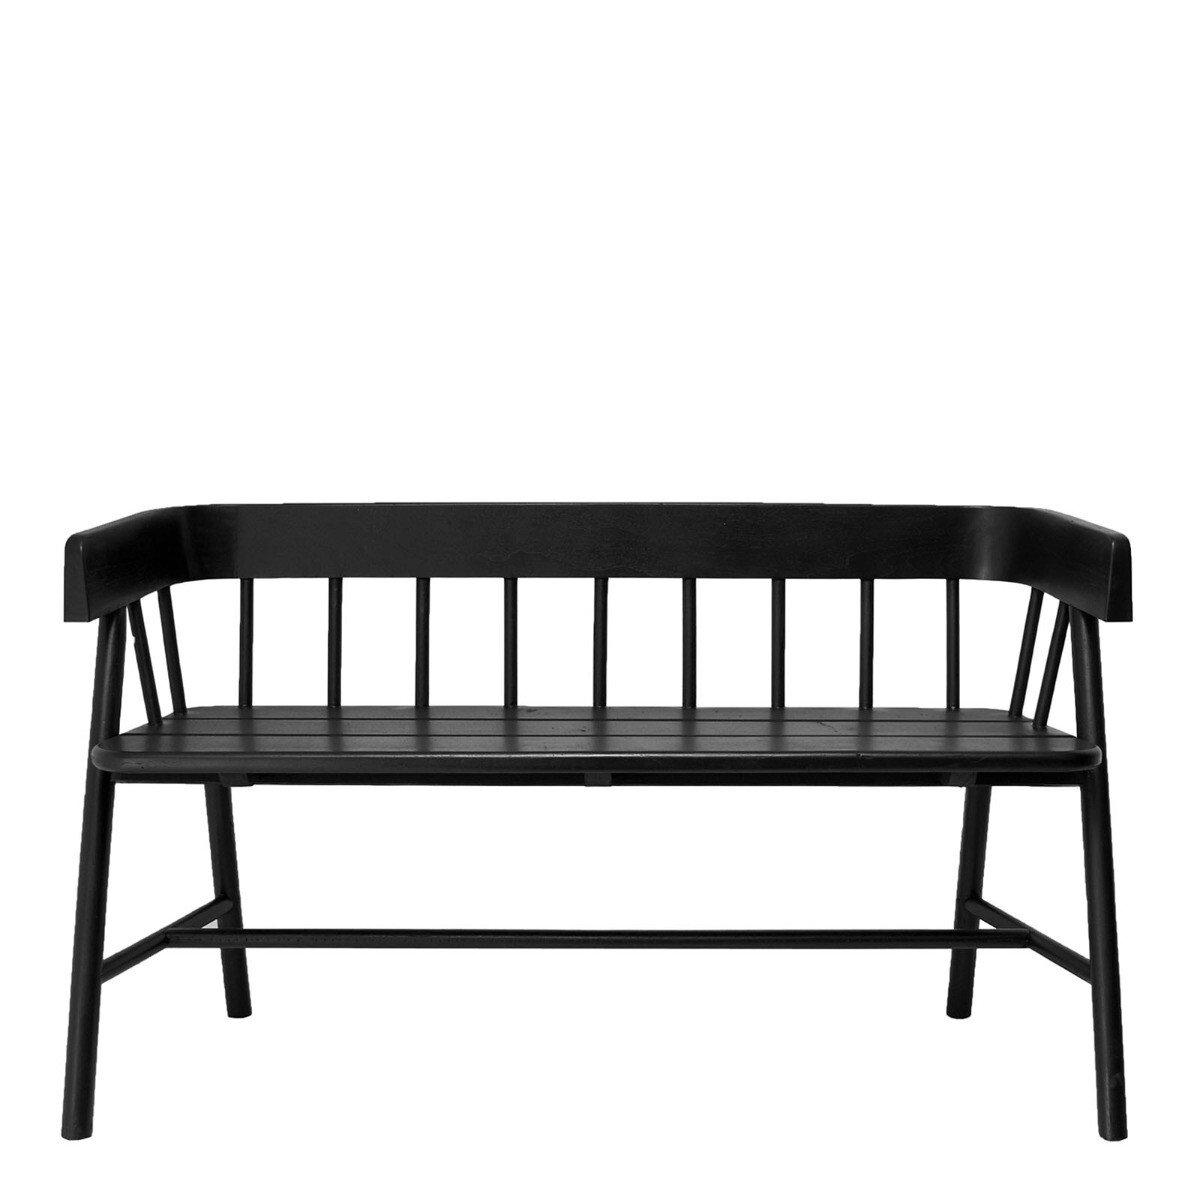 HKliving eetkamerbank hout zwart 72 x 123 x 45